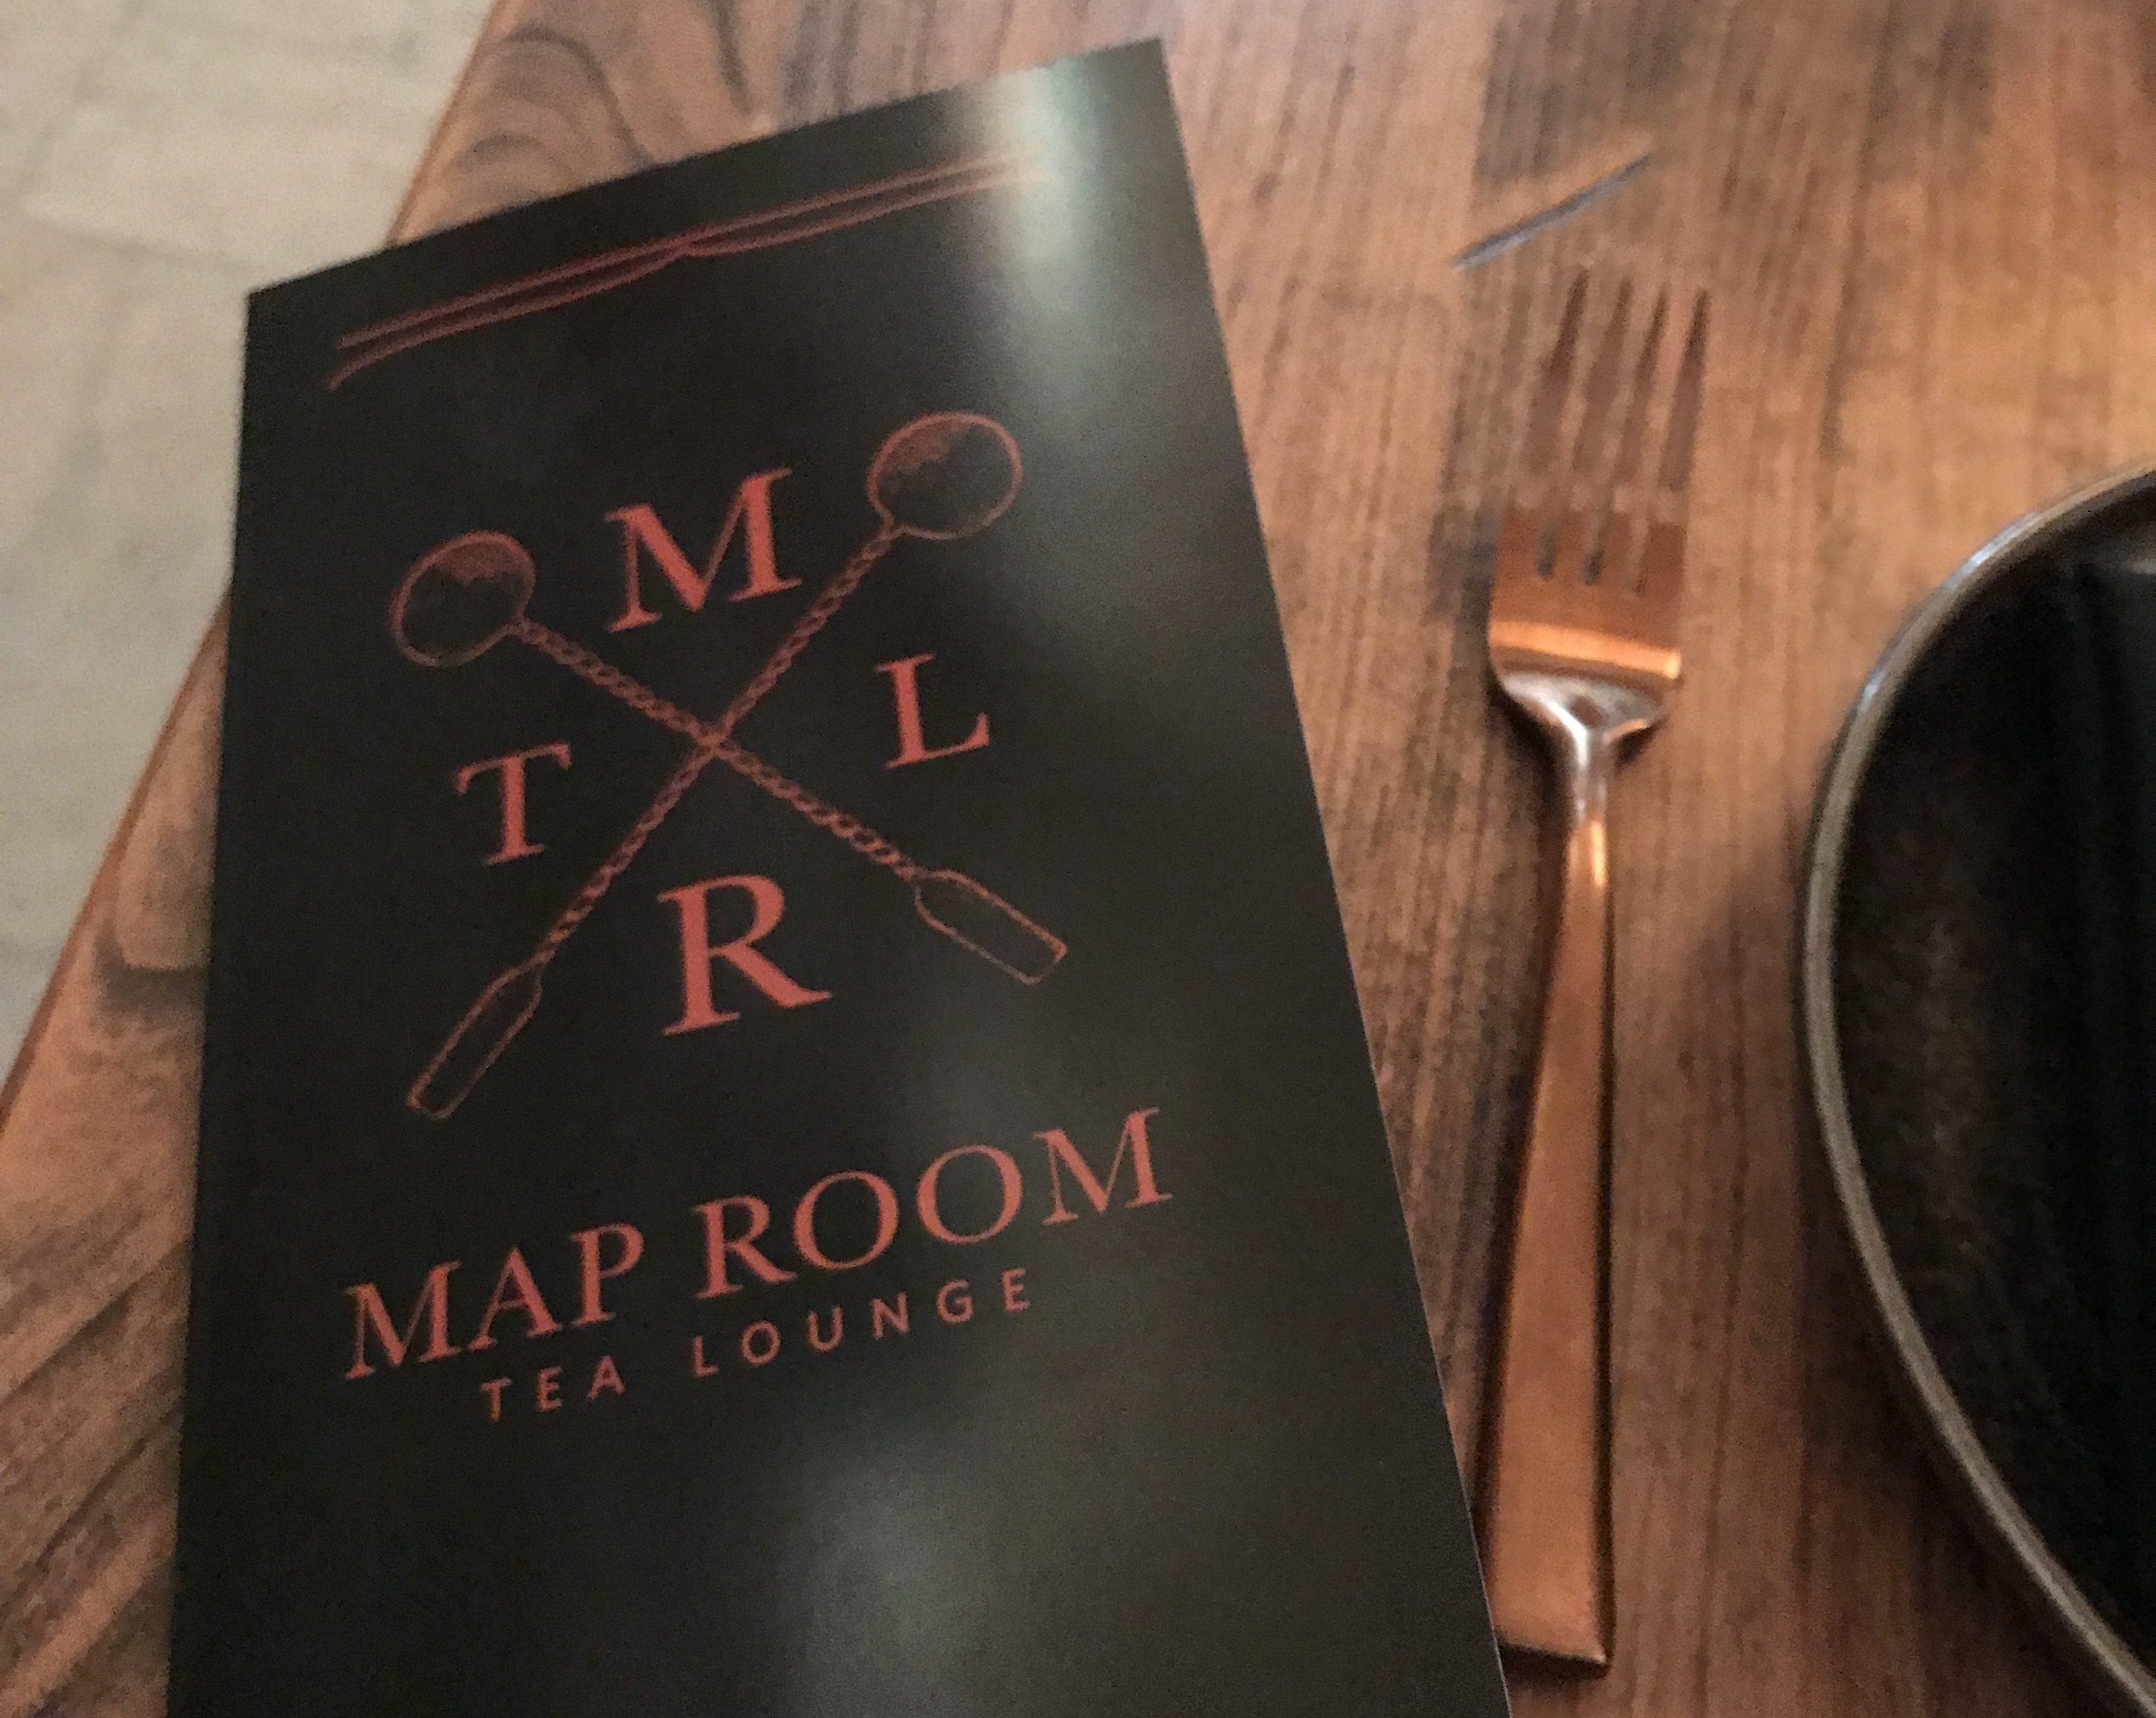 The Map Room Tea Lounge logo and menu.